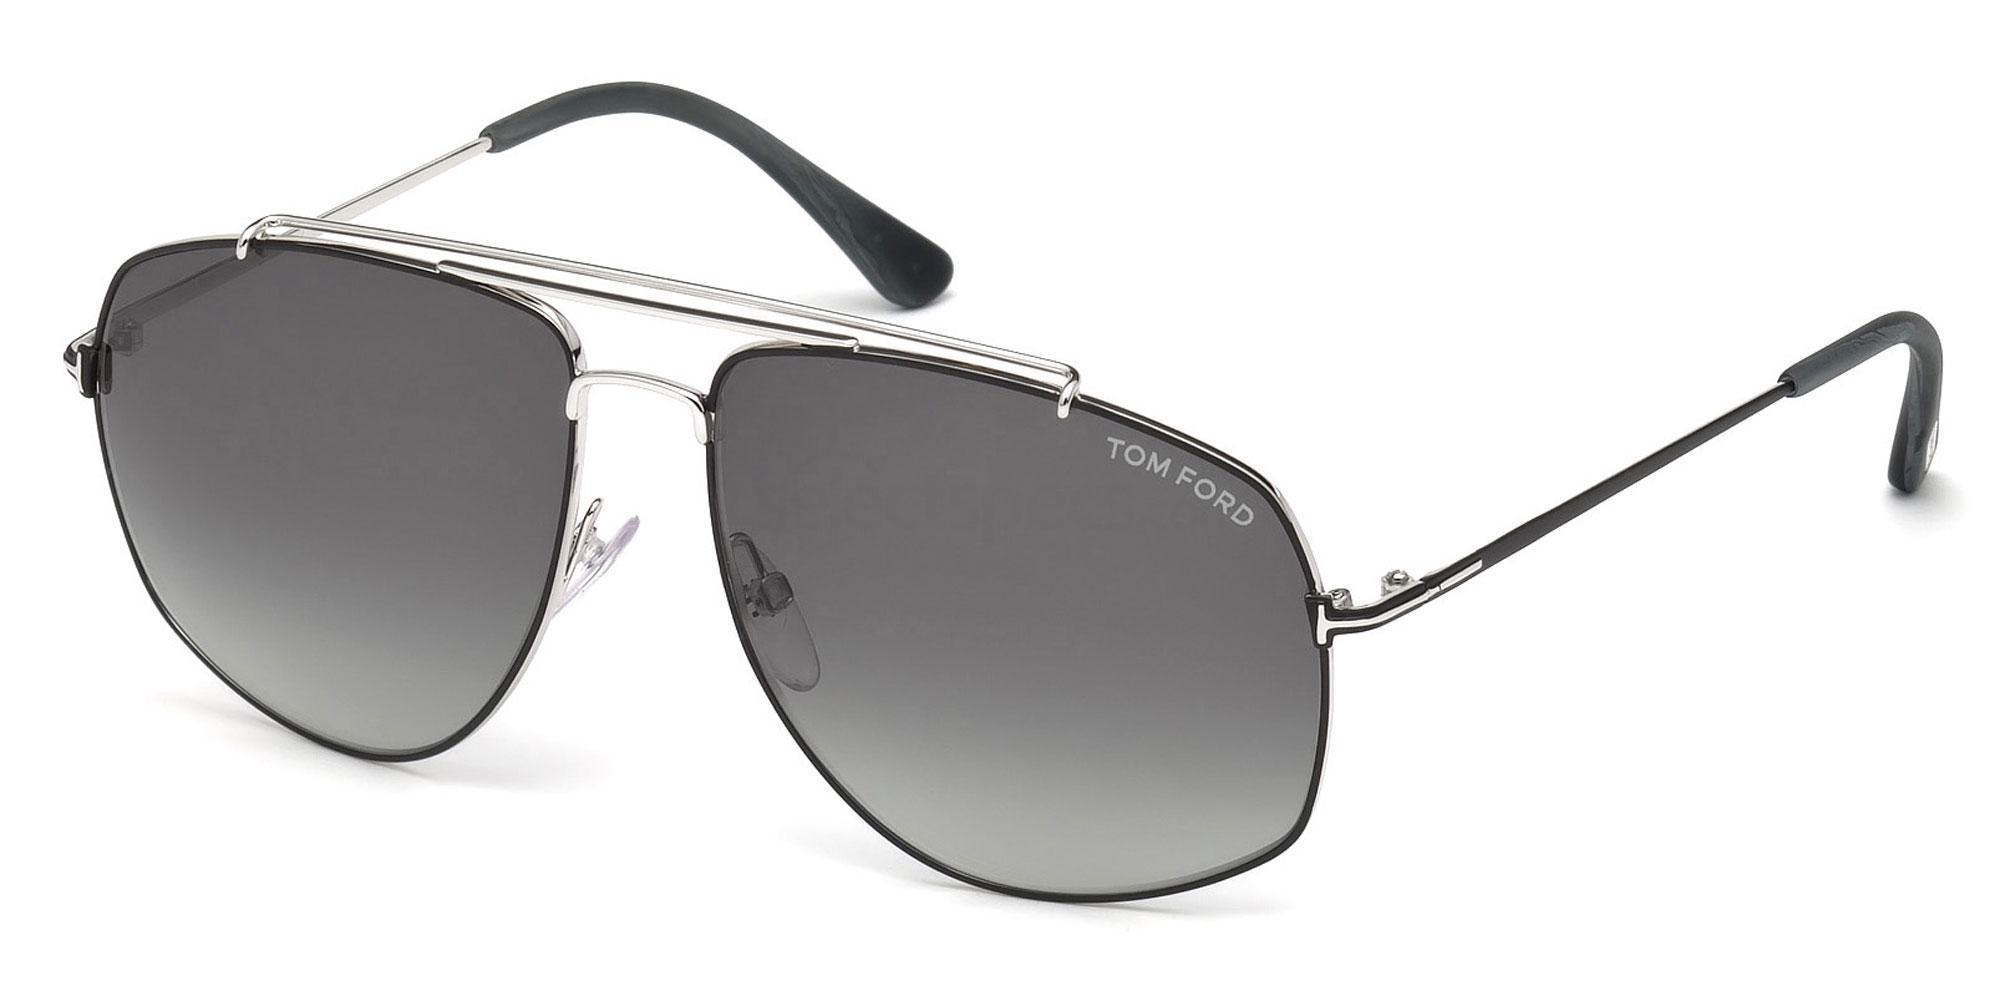 18A FT0496 Sunglasses, Tom Ford